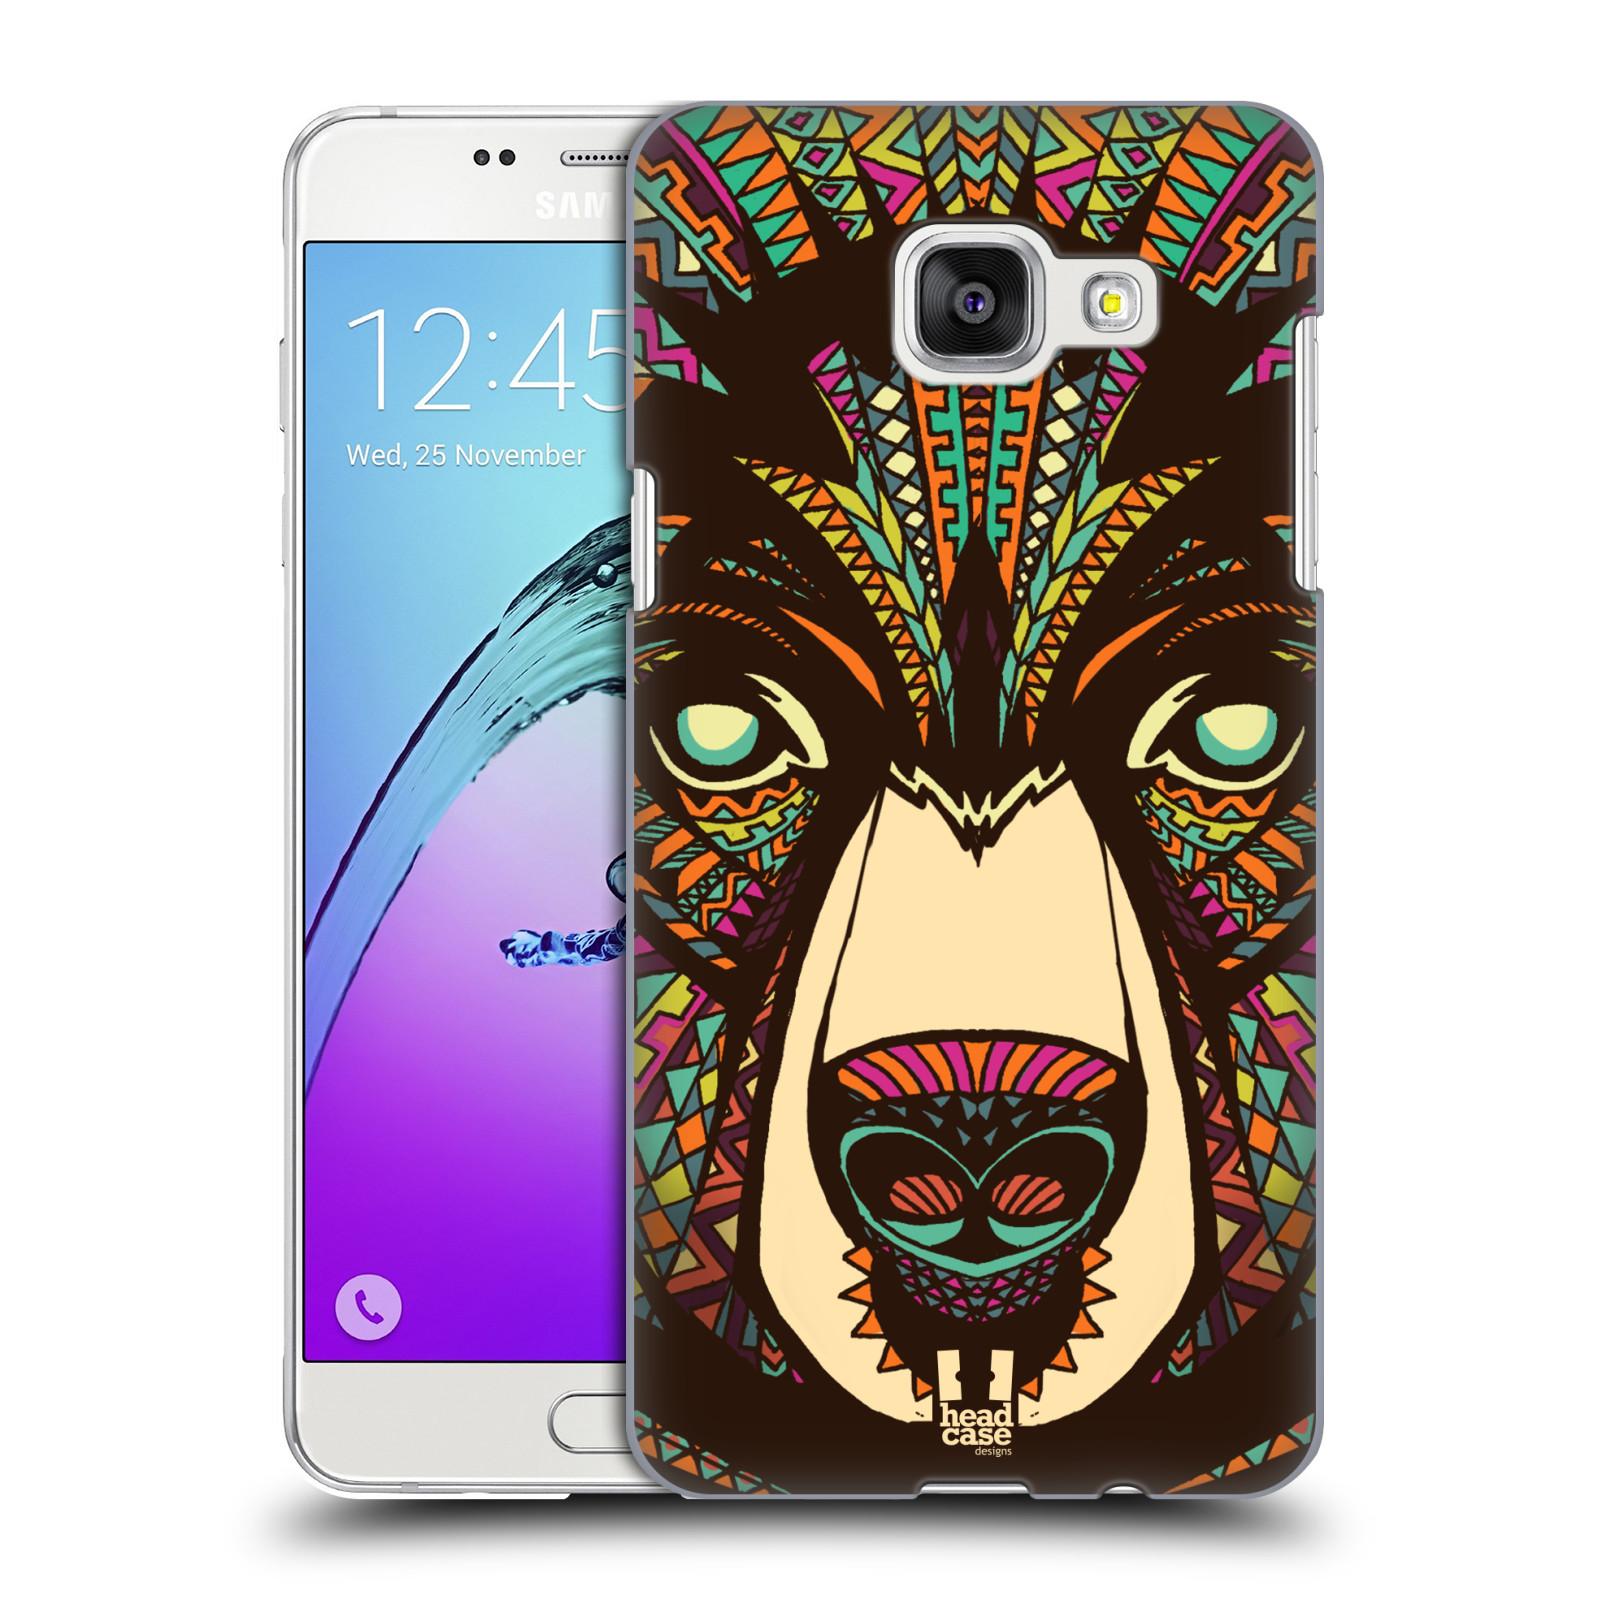 Plastové pouzdro na mobil Samsung Galaxy A5 (2016) HEAD CASE AZTEC MEDVĚD